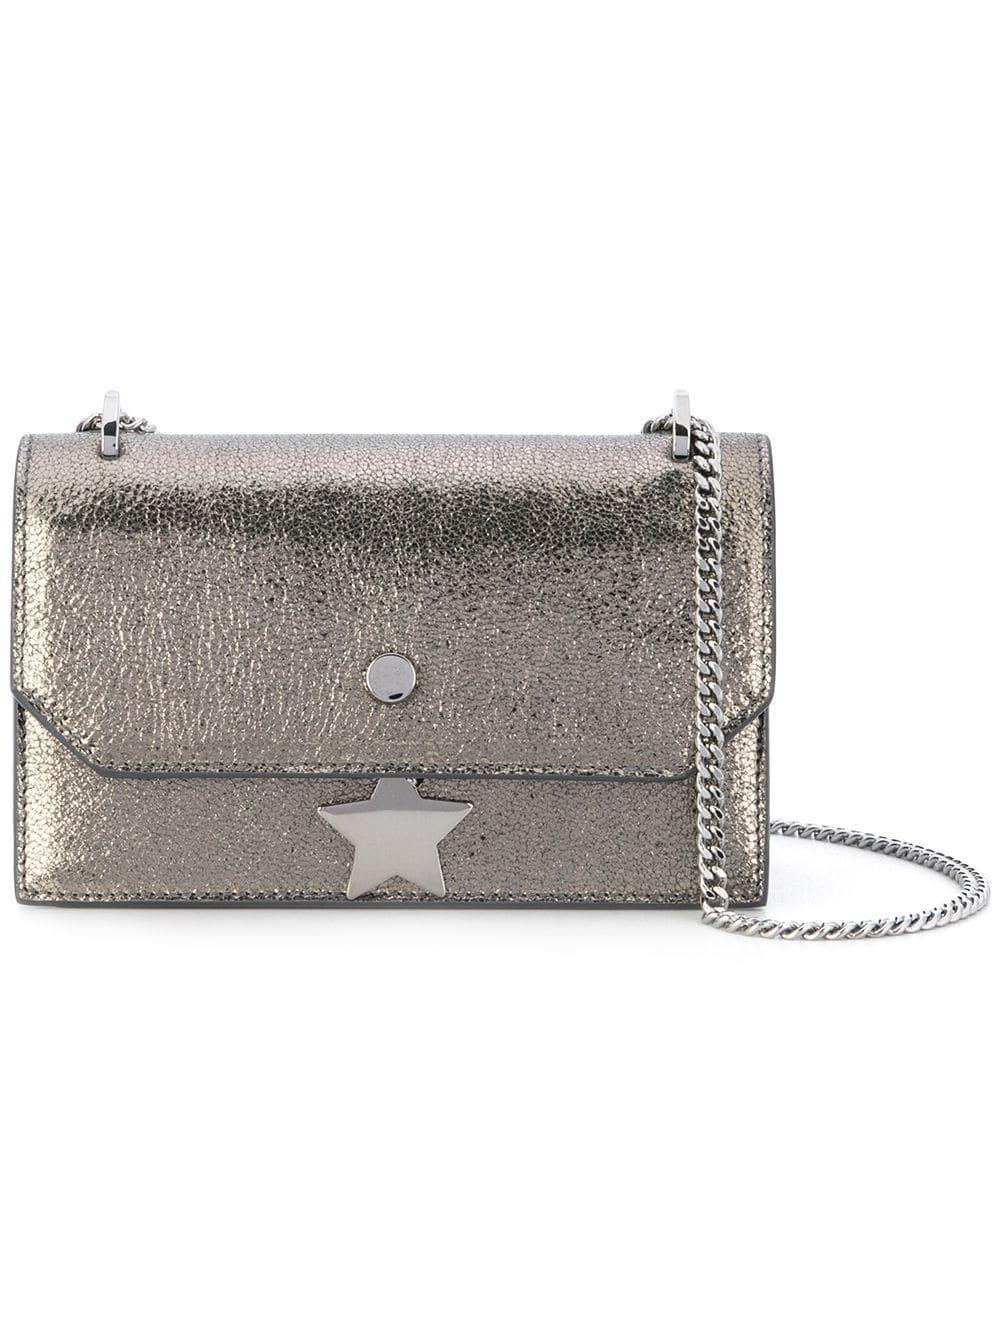 34c8feccf8f Jimmy Choo shoulder bag, Luxury, Bags & Wallets, Handbags on Carousell